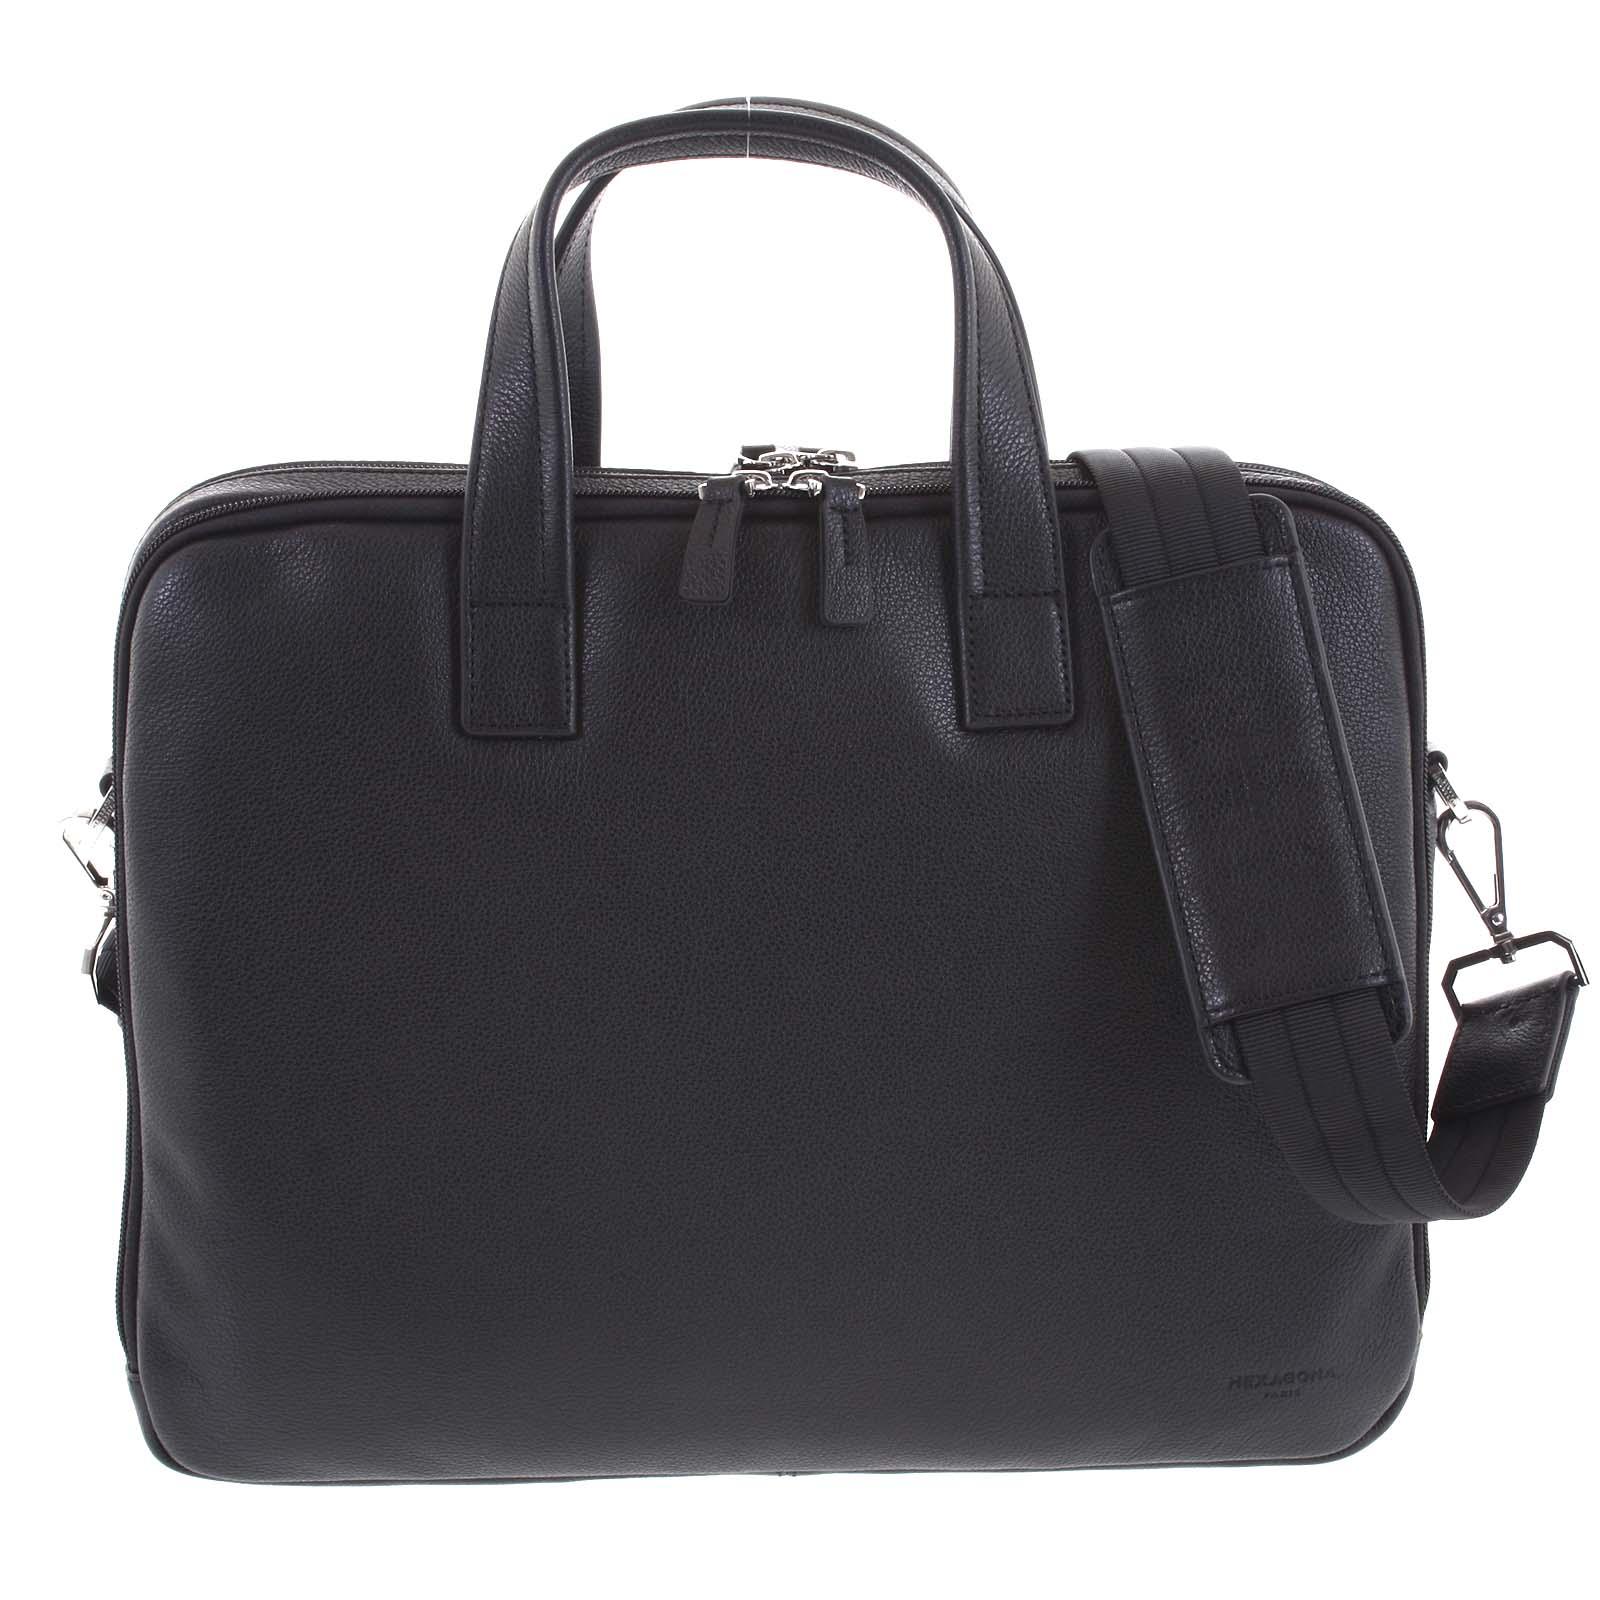 Luxusní kožená taška černá - Hexagona Saturday